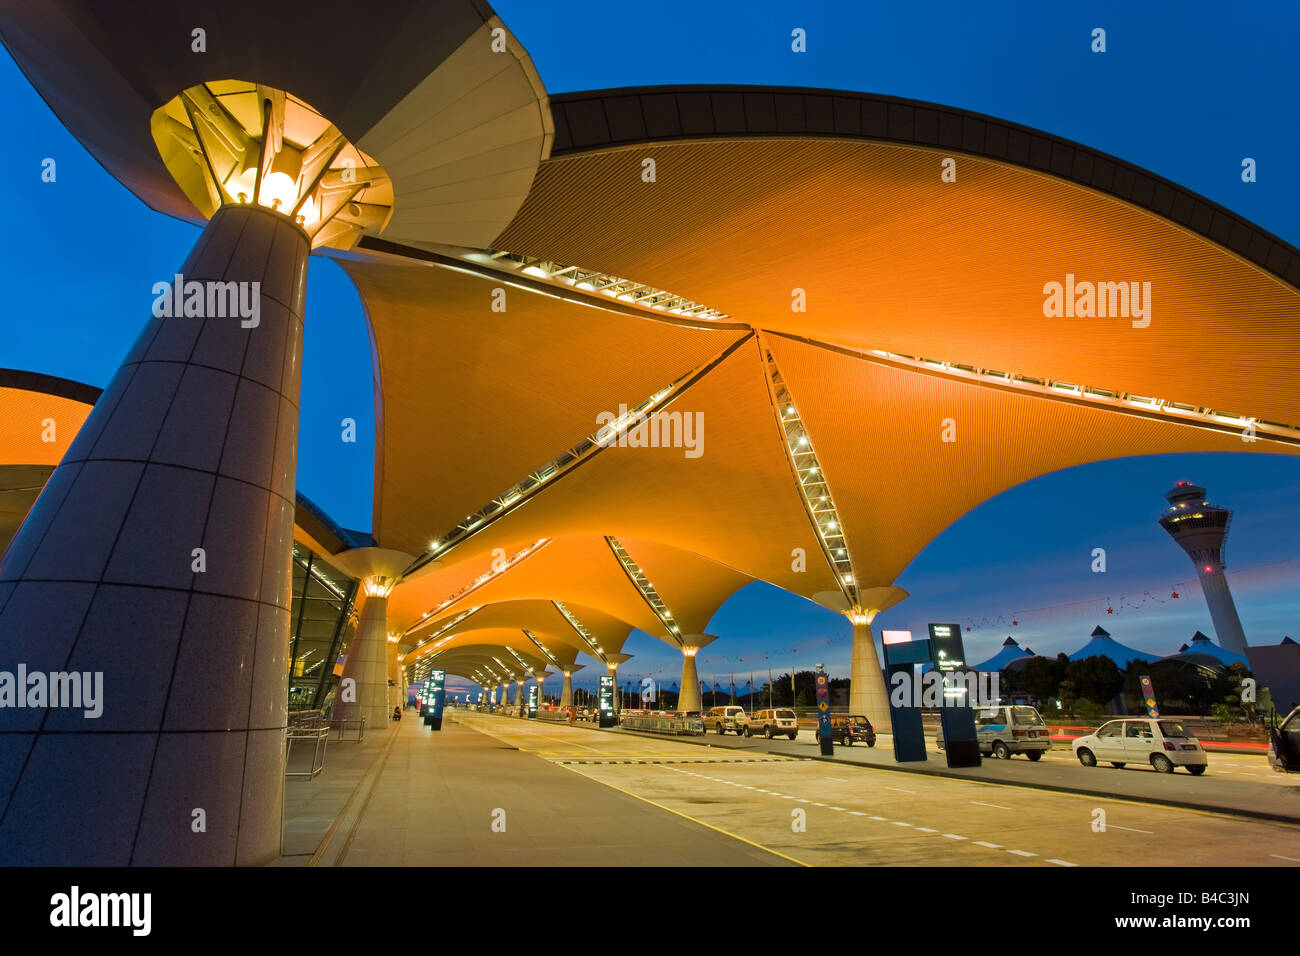 Asia, Malasia, Kuala Lumpur, el aeropuerto internacional de Kuala Lumpur, KLIA, moderna arquitectura exterior Imagen De Stock